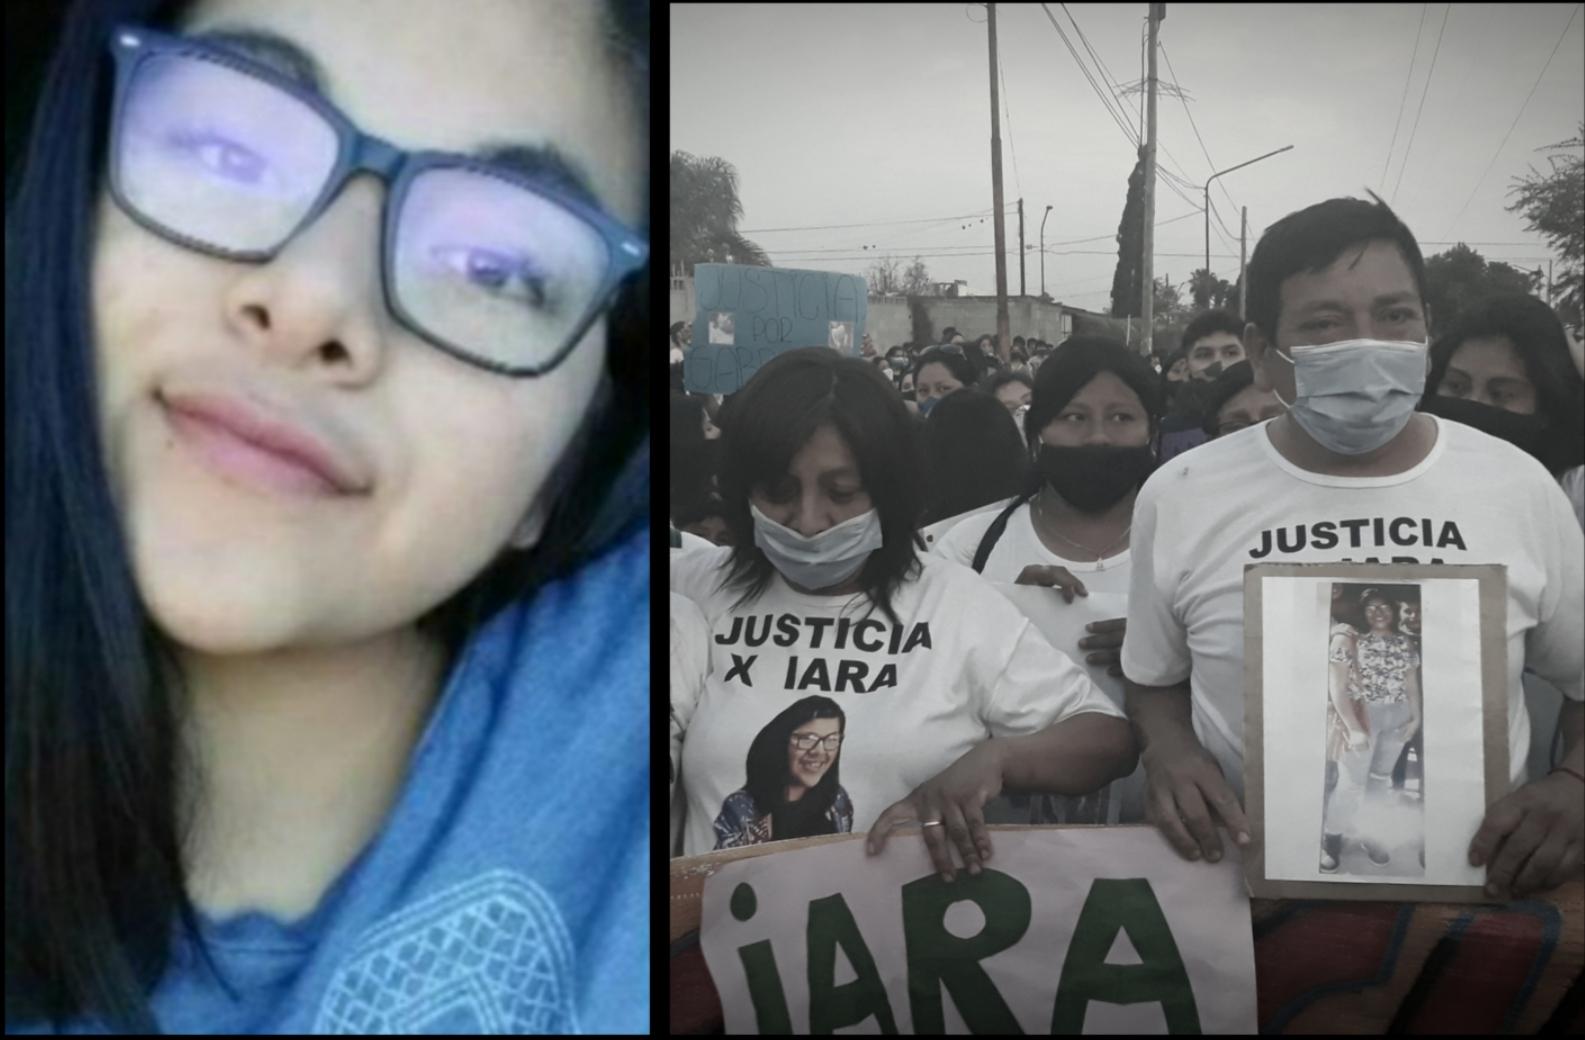 Mañana se cumplirán cuatro meses del femicidio de Iara Rueda